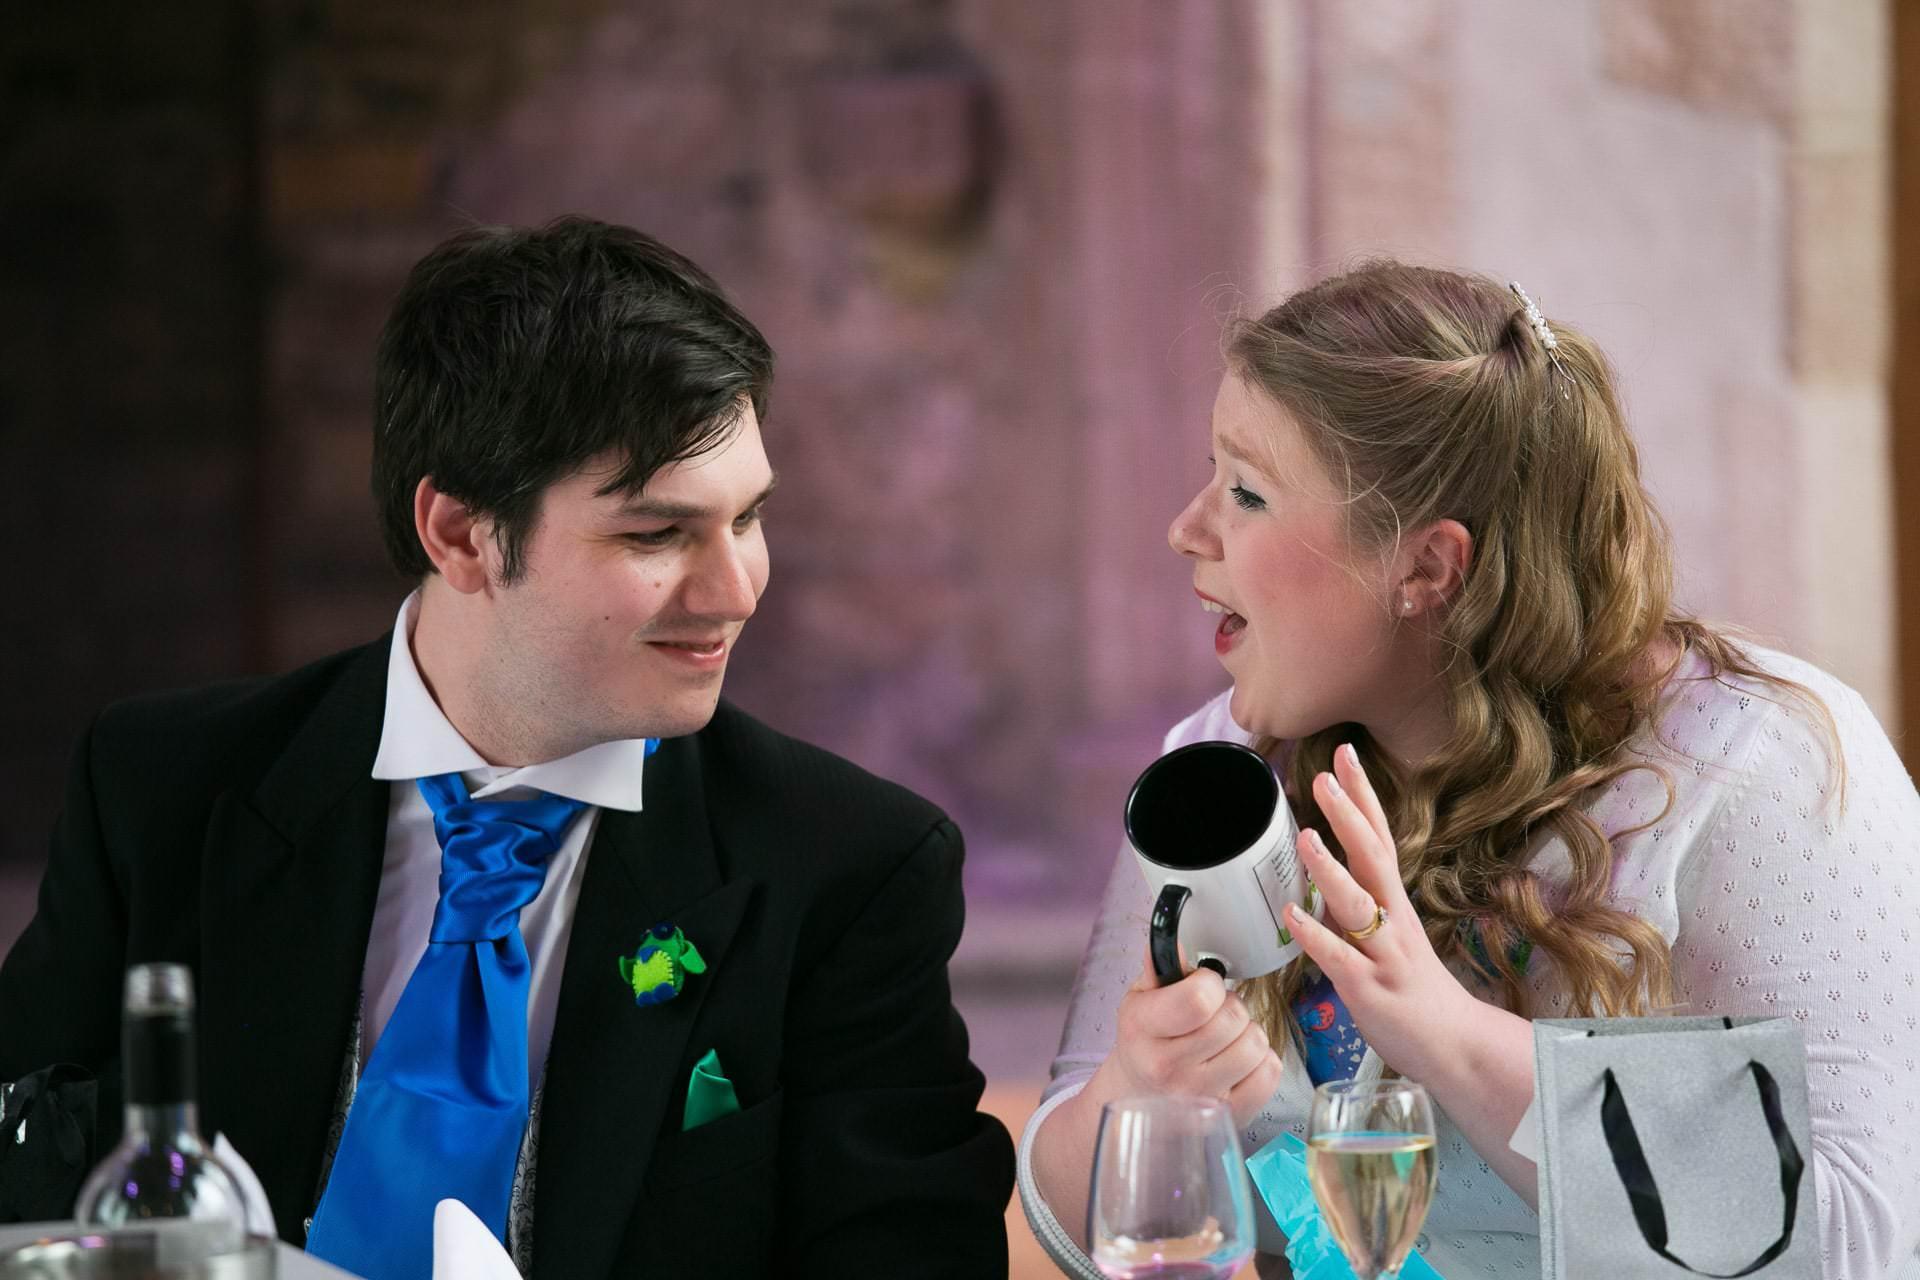 dartington hall wedding photographer 46